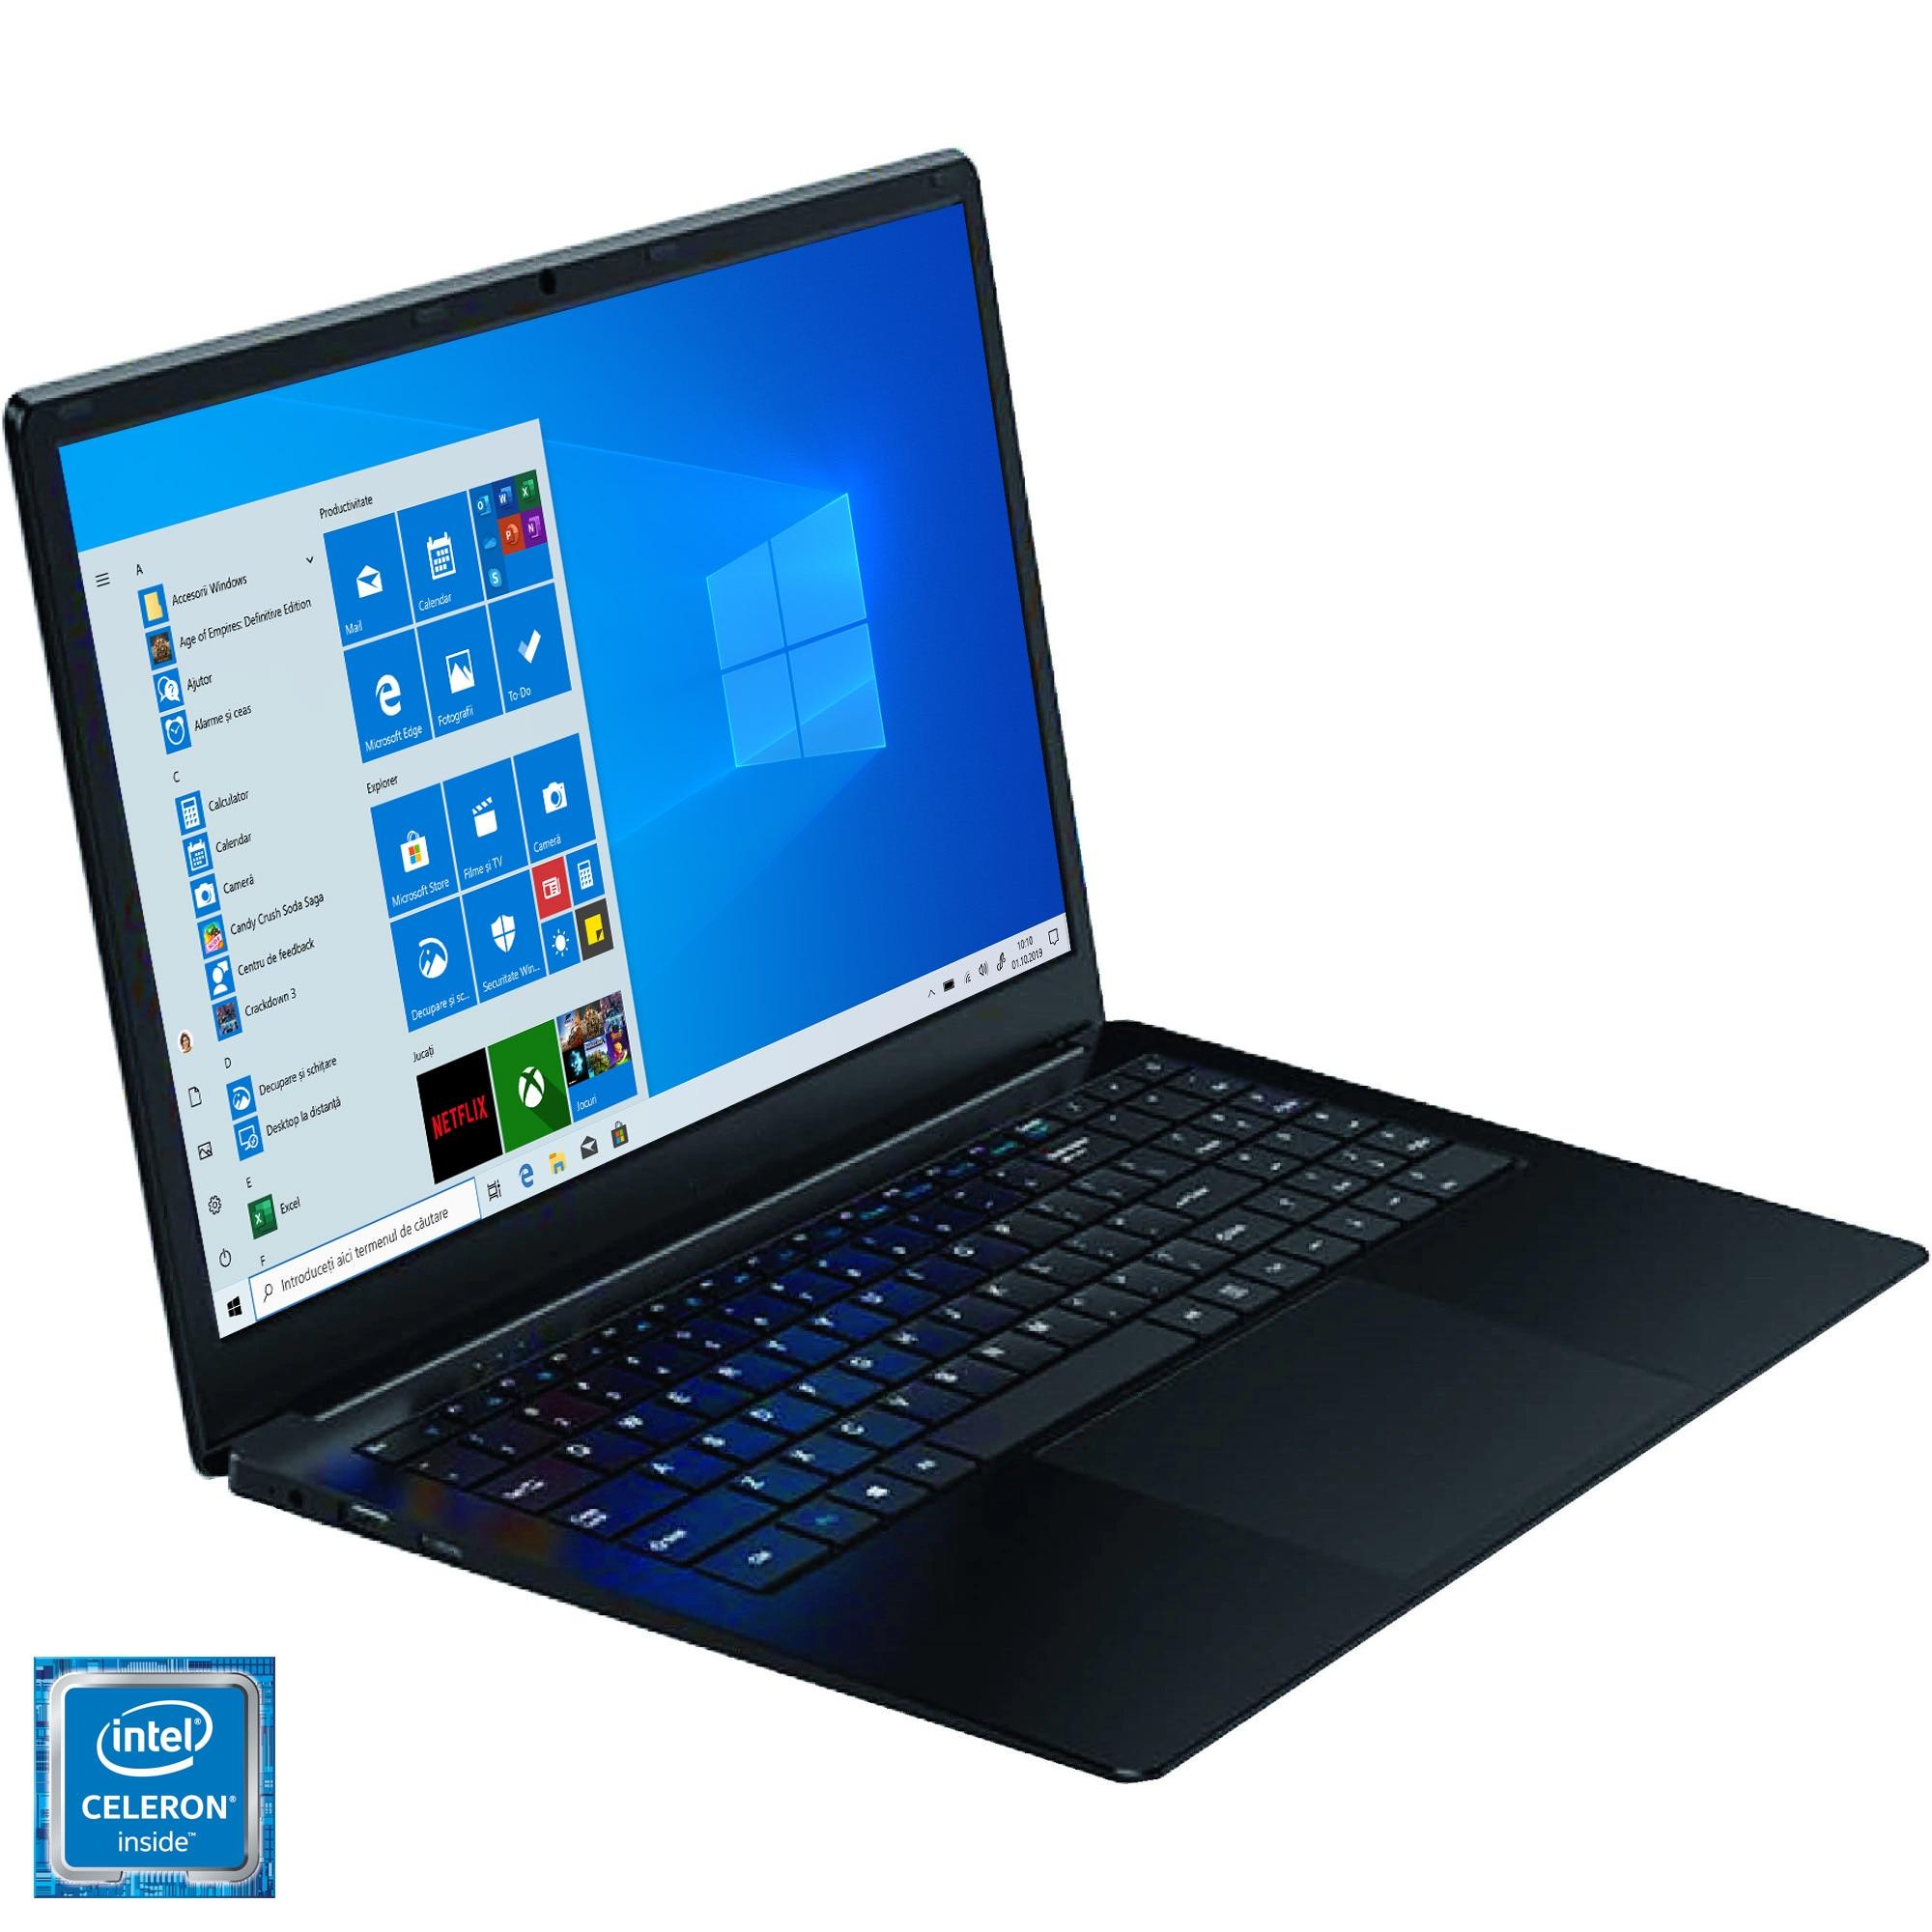 "Fotografie Laptop Weigo 156H cu procesor Intel® Celeron® N4100 pana la 2.40 GHz, 15.6"", Full HD, 8GB, 128GB SSD + 64GB eMMC, Intel UHD Graphics 600, Windows 10 Pro, Black"